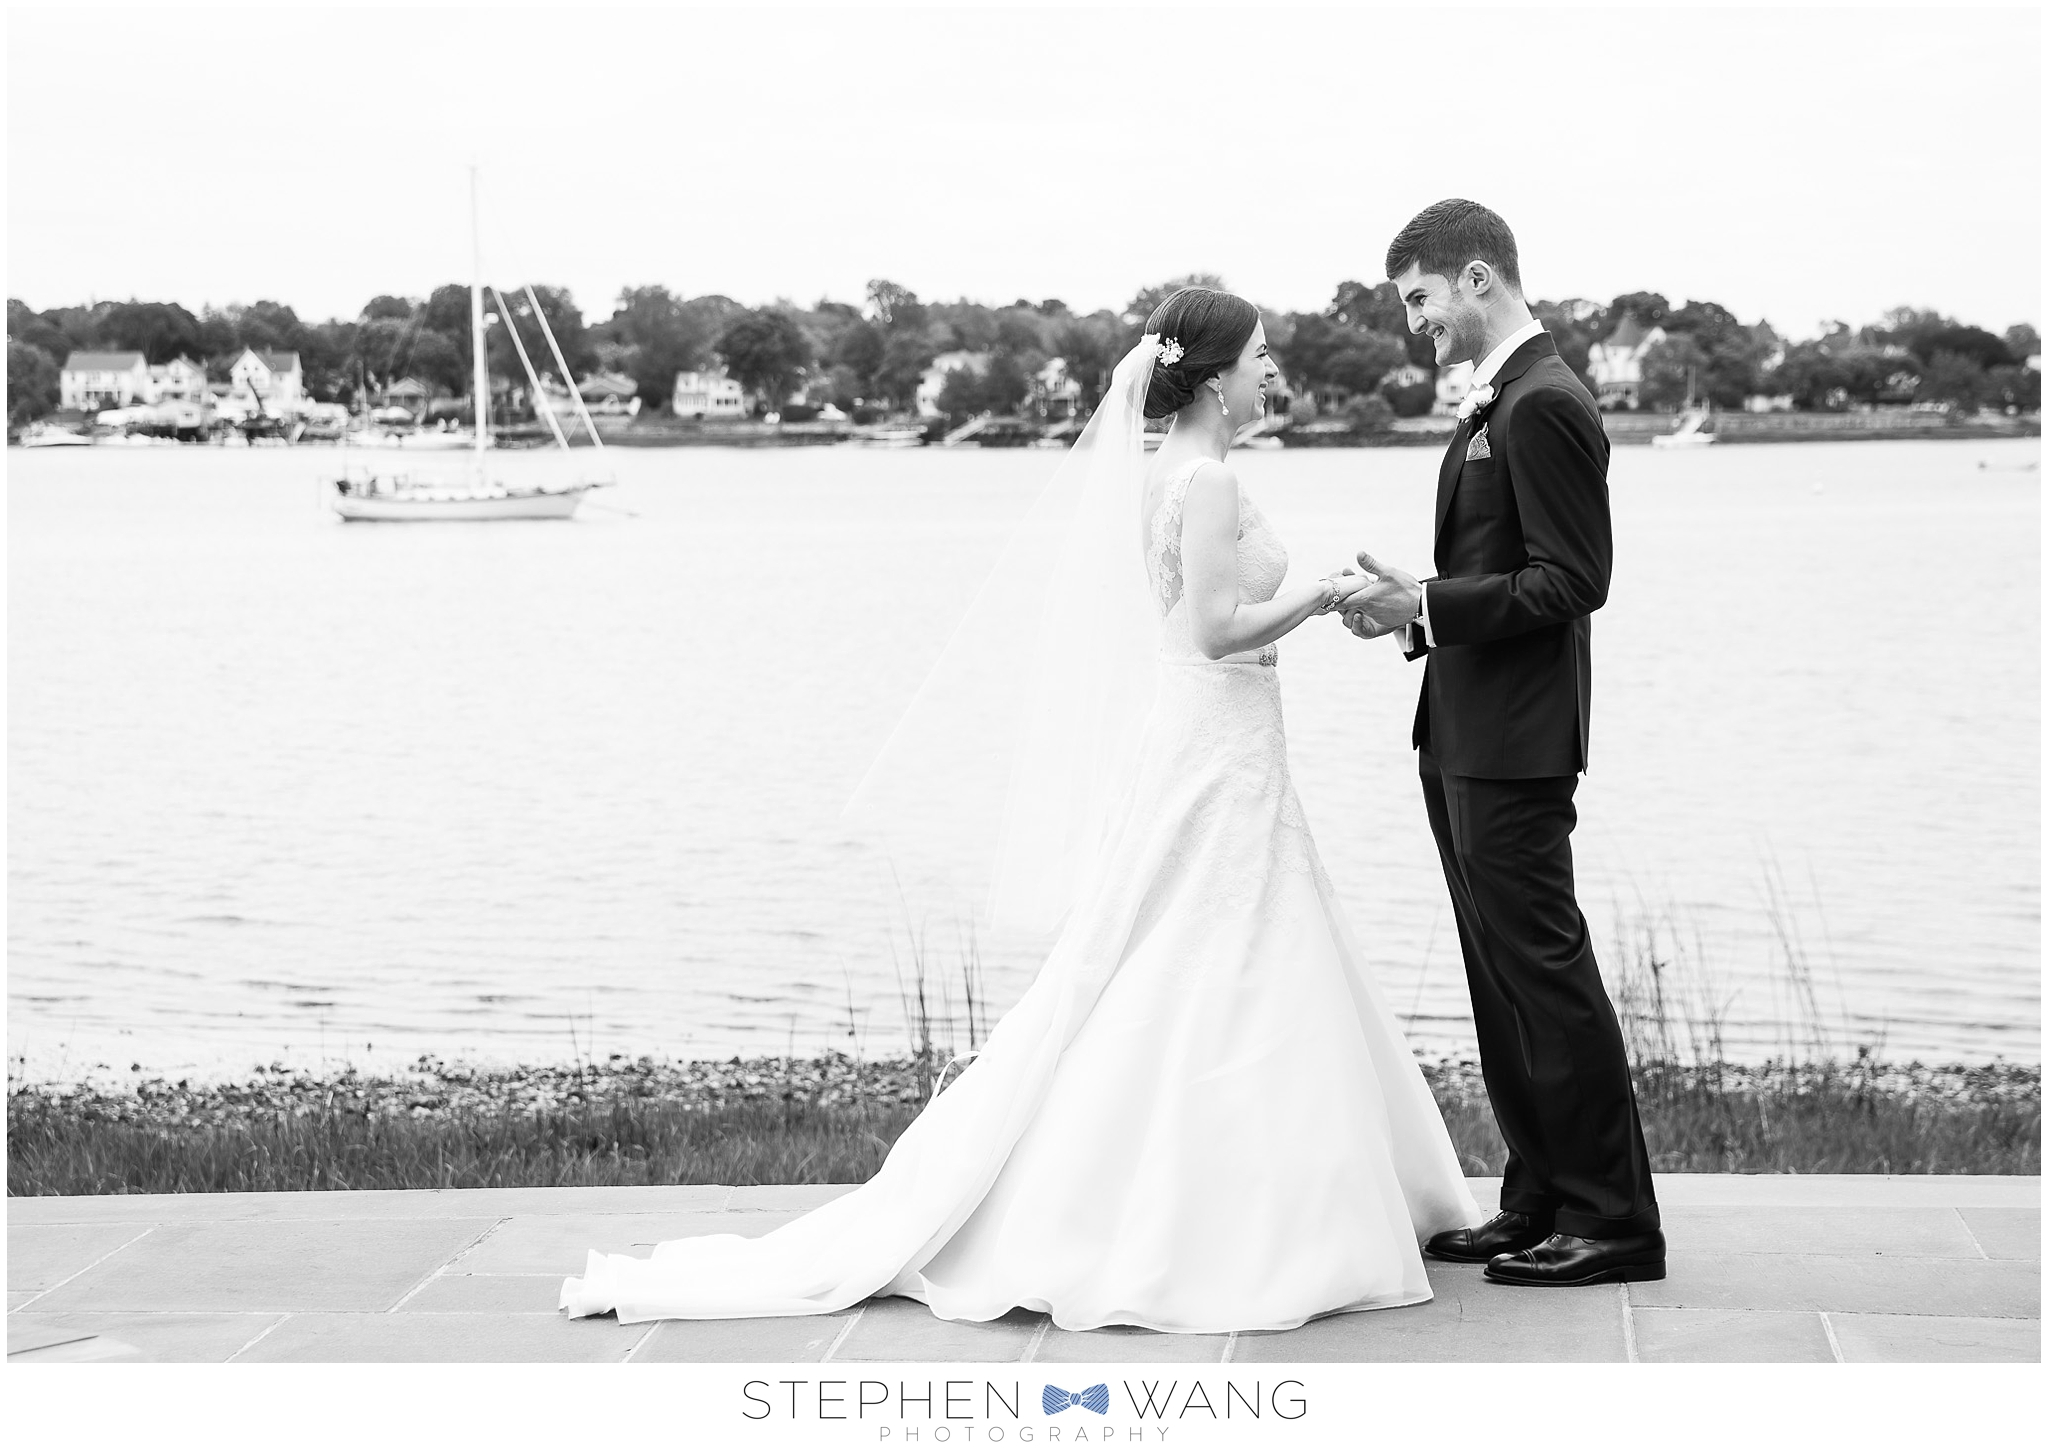 Stephen Wang Photography Shorehaven Norwalk CT Wedding Photographer connecticut shoreline shore haven - 12.jpg